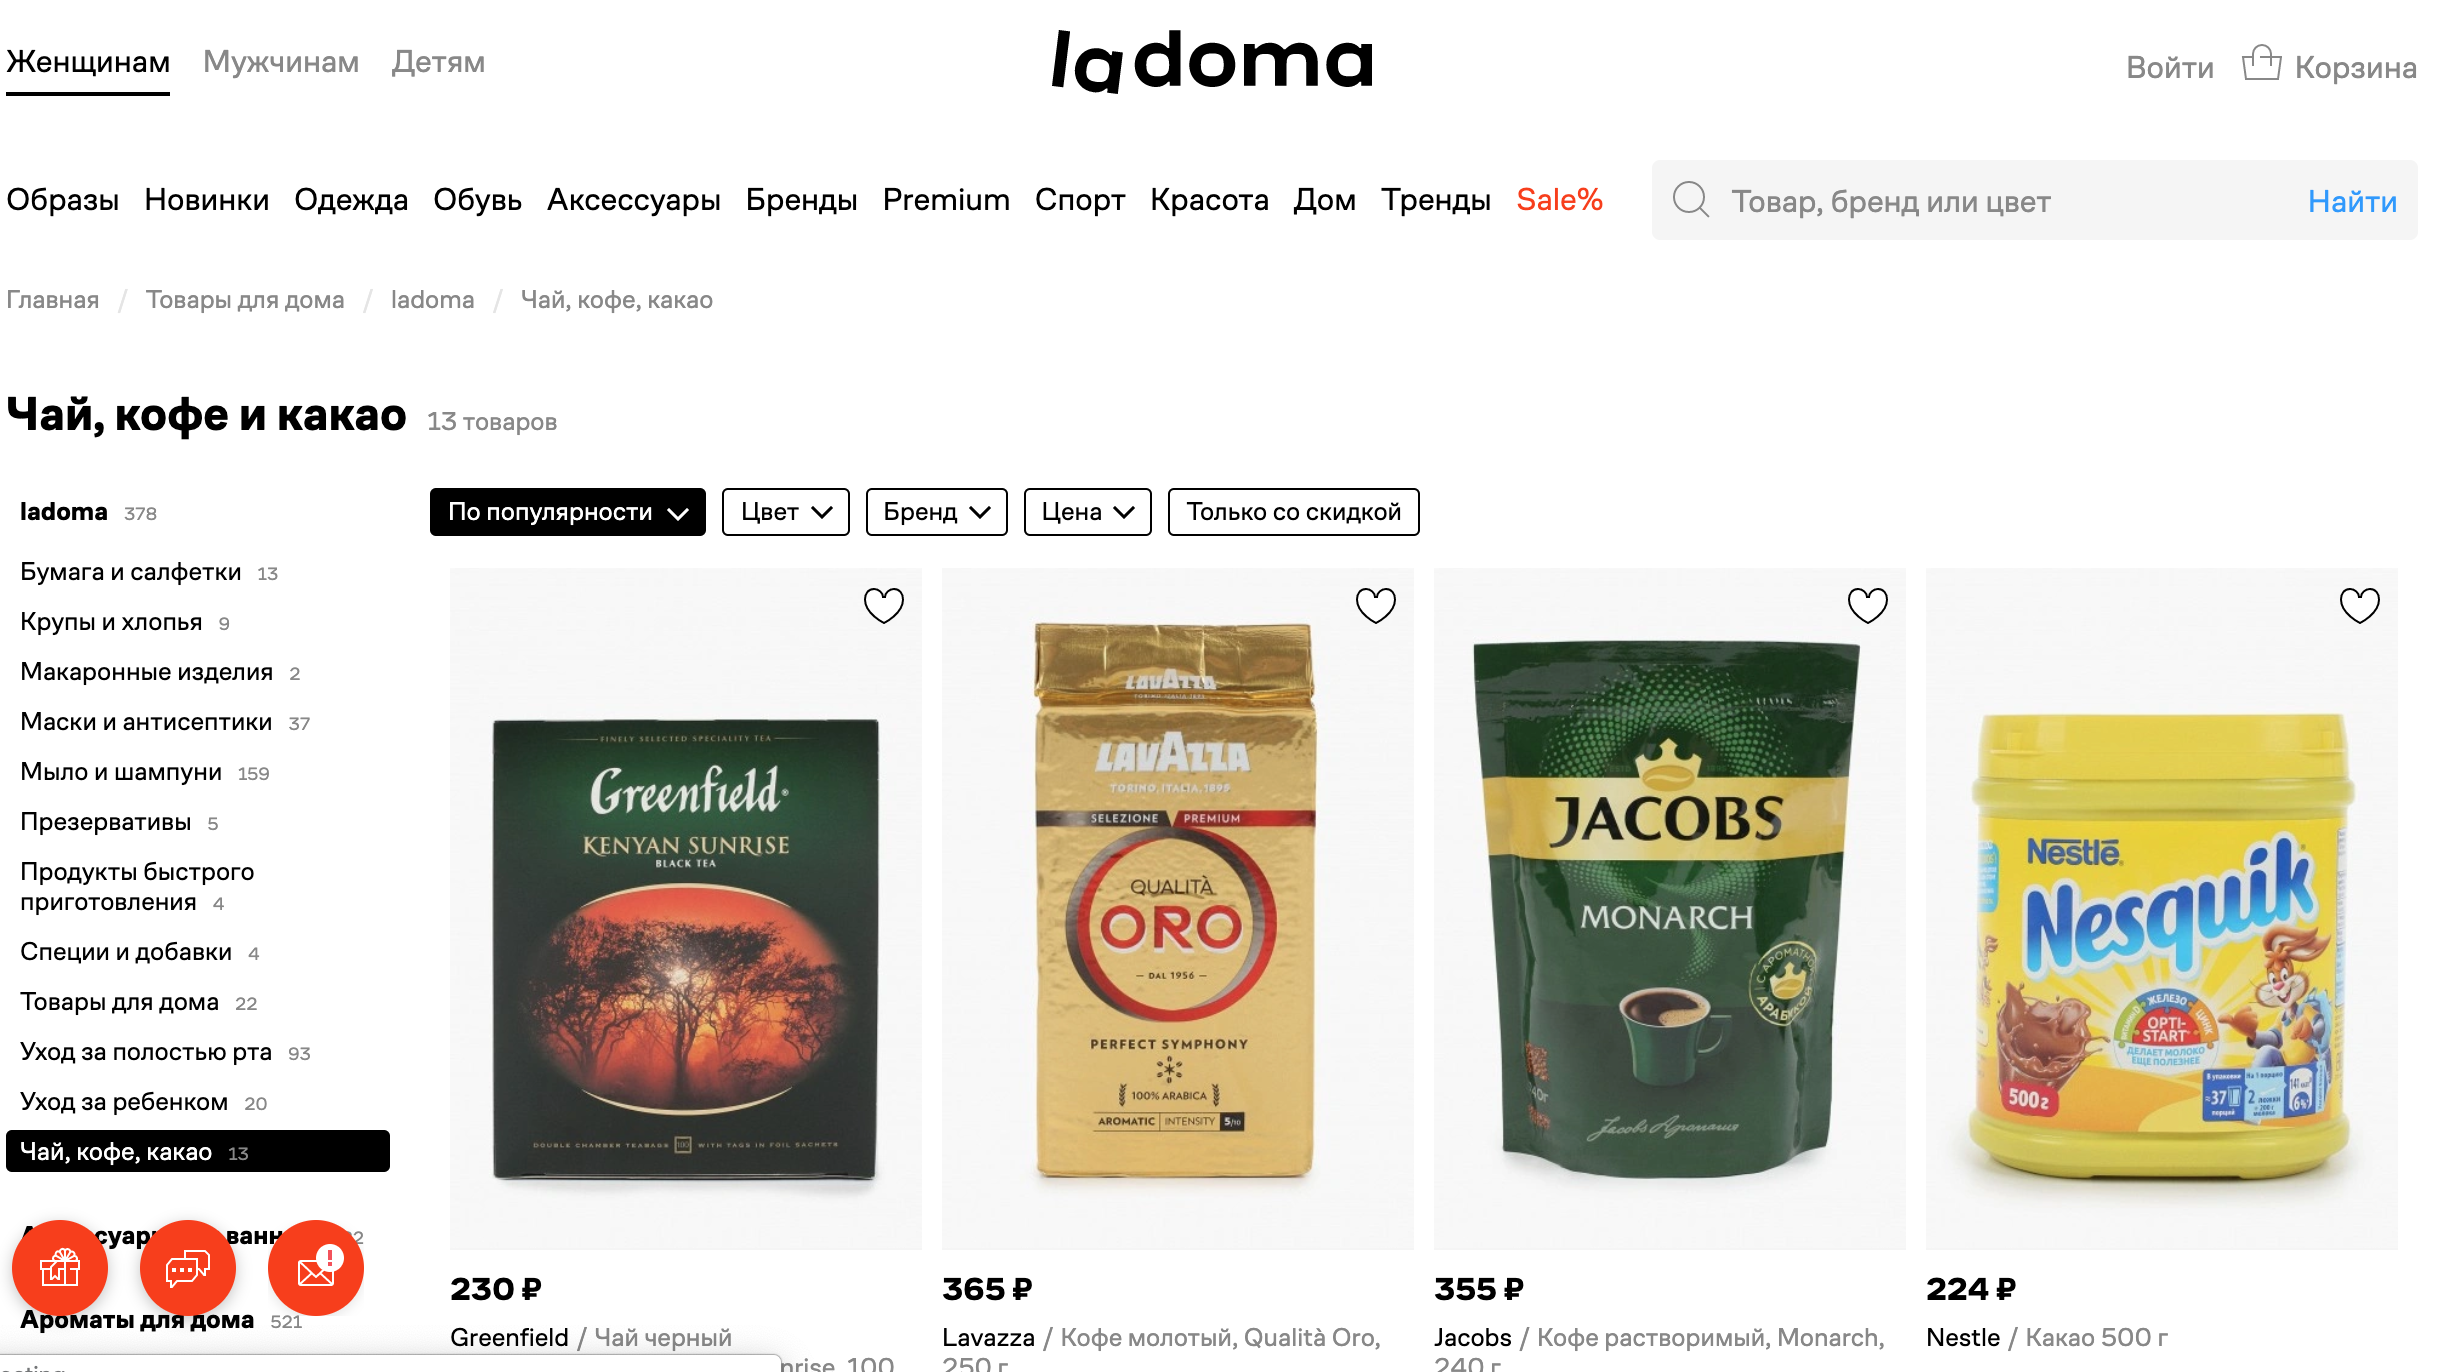 Раздел с товарами для дома ladoma